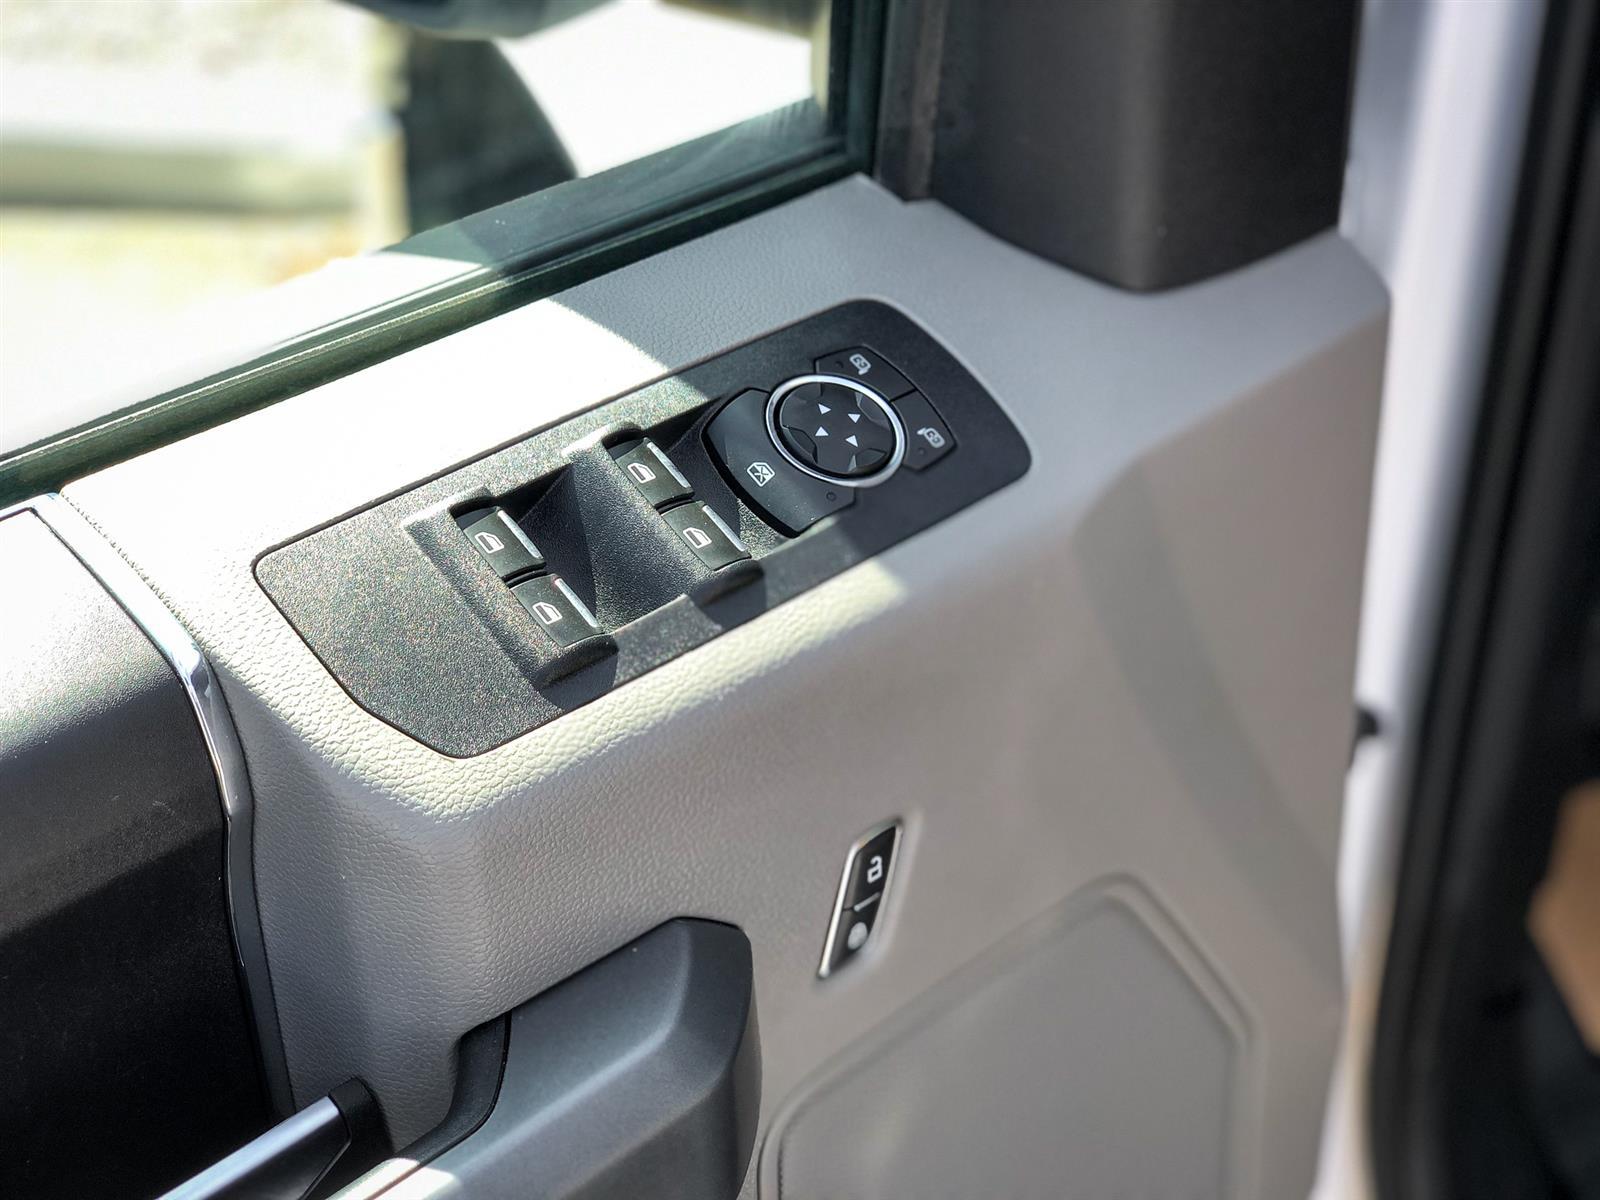 2018 Ford F-150 XLT | 5.0L V8 | 4X4 | REMOTE START | SYNC